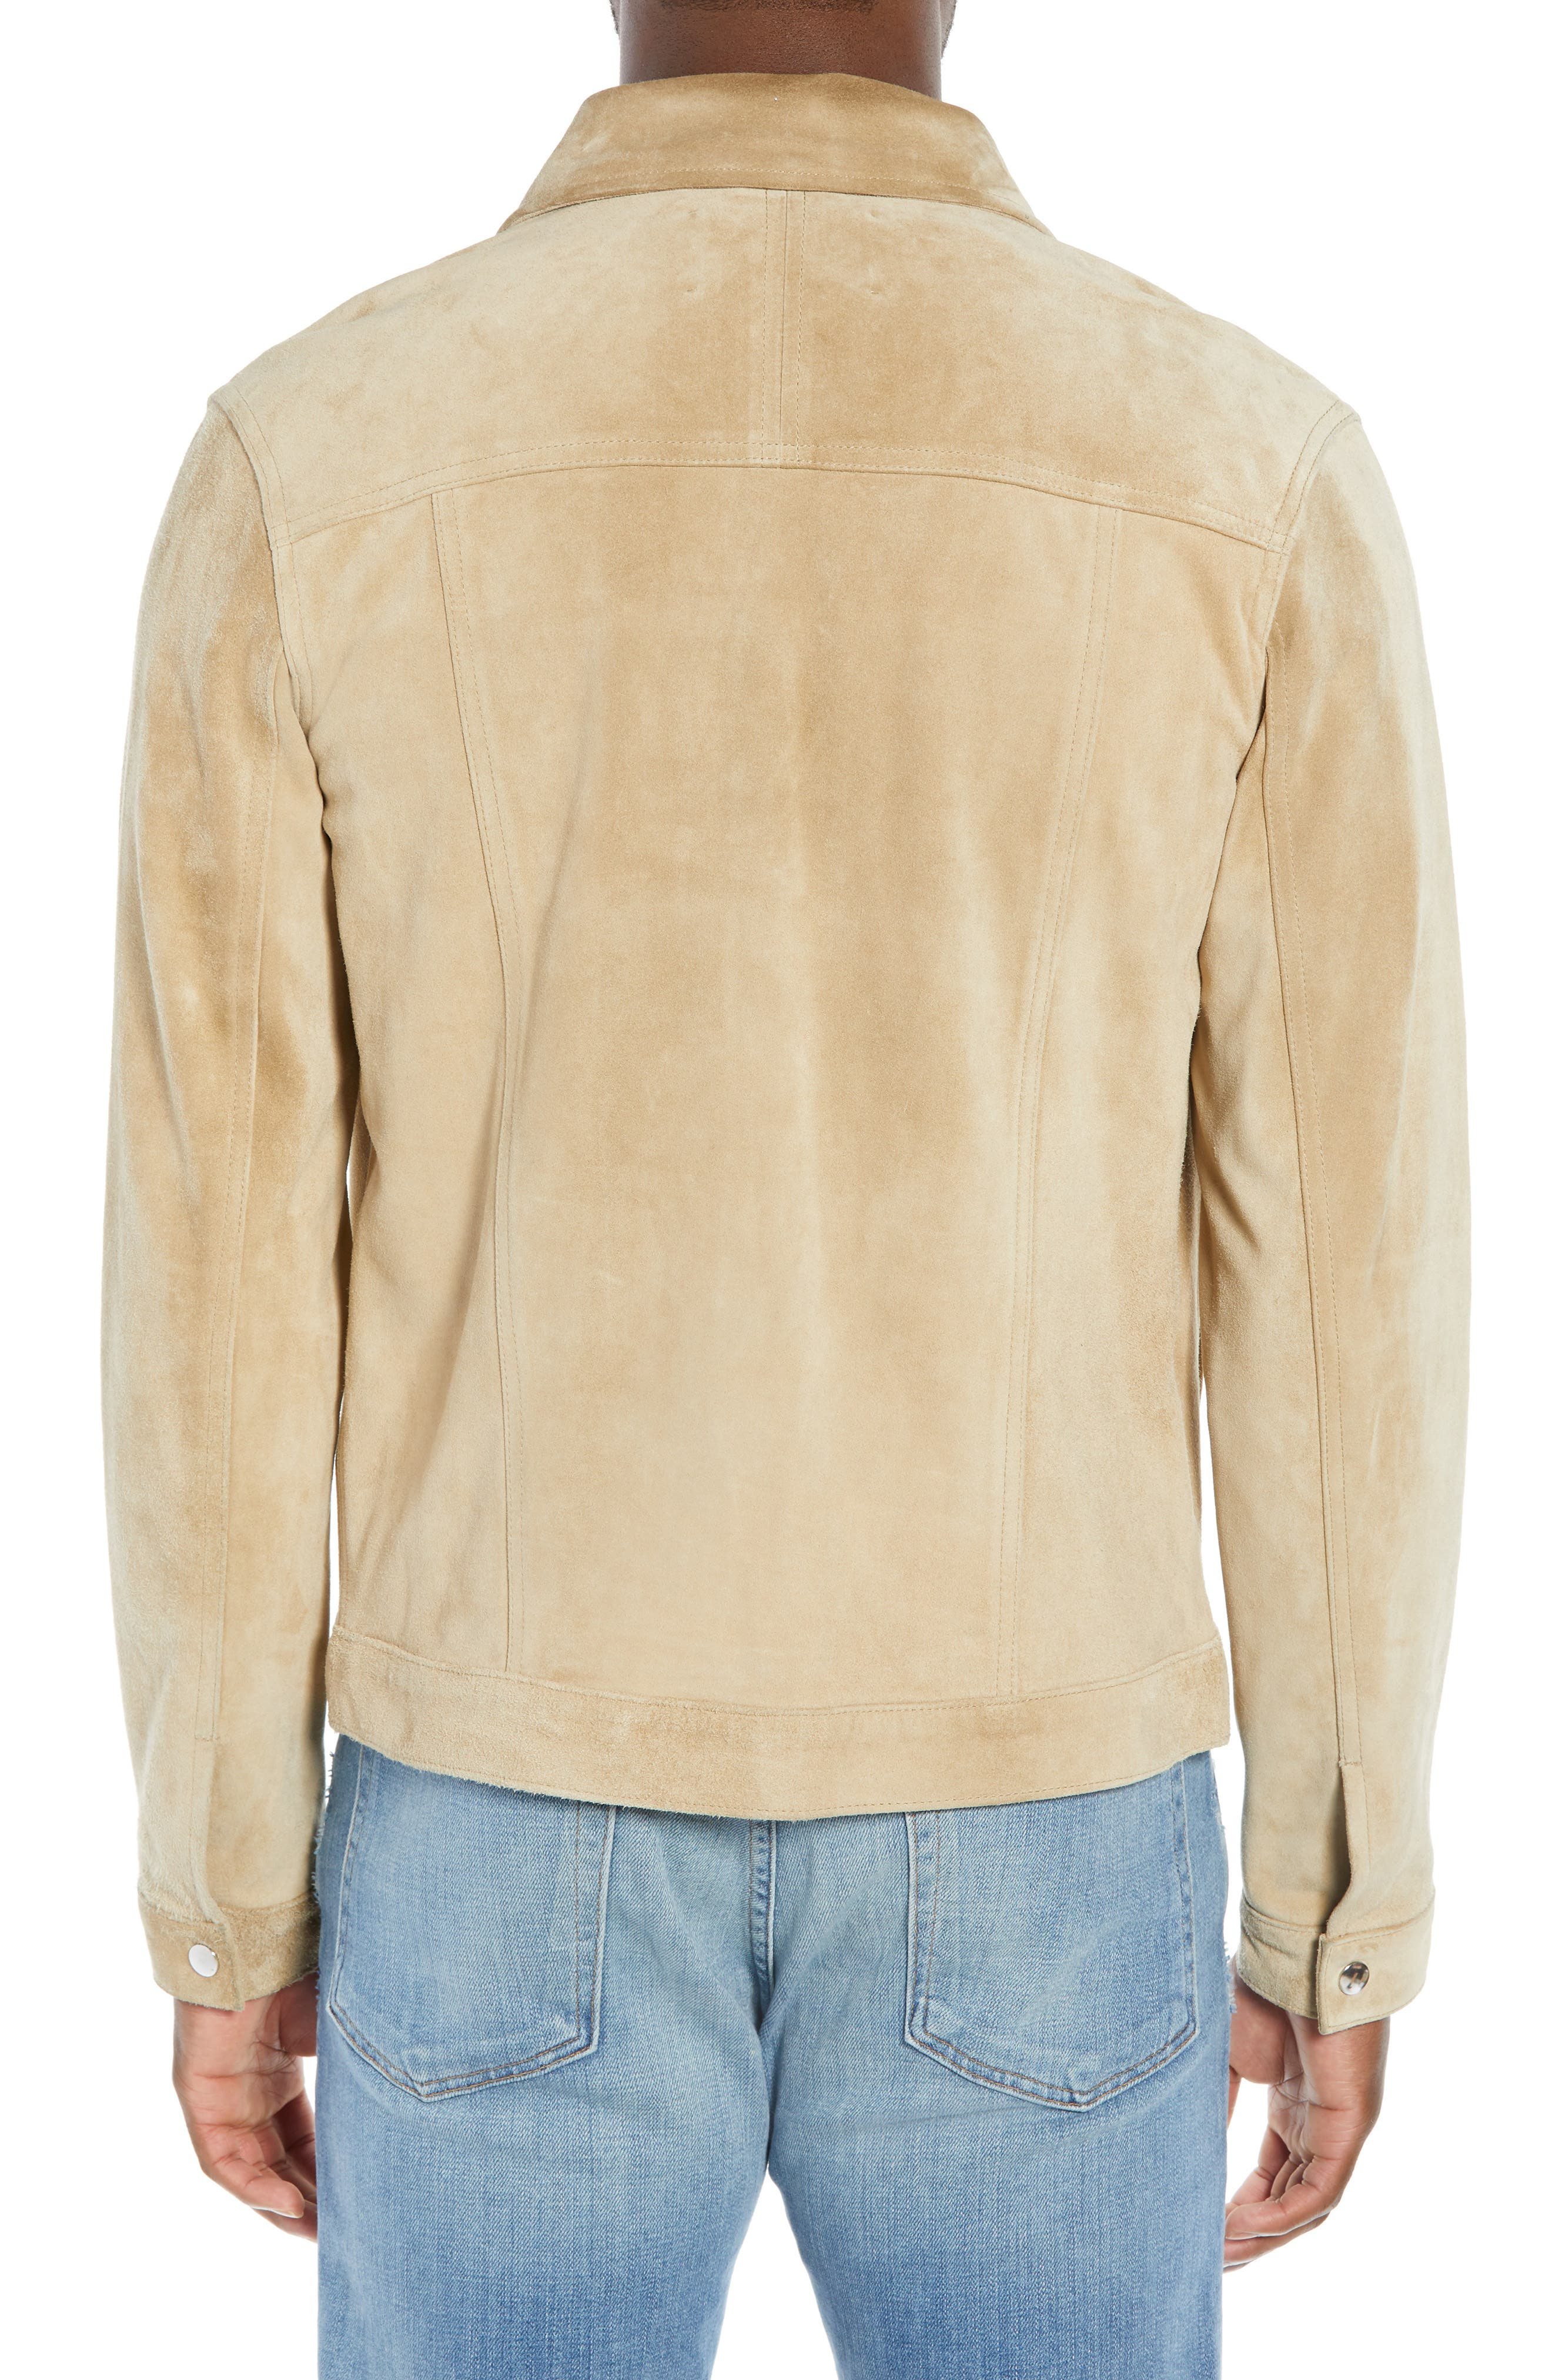 Slim Fit Leather Western Jacket,                             Alternate thumbnail 2, color,                             KHAKI